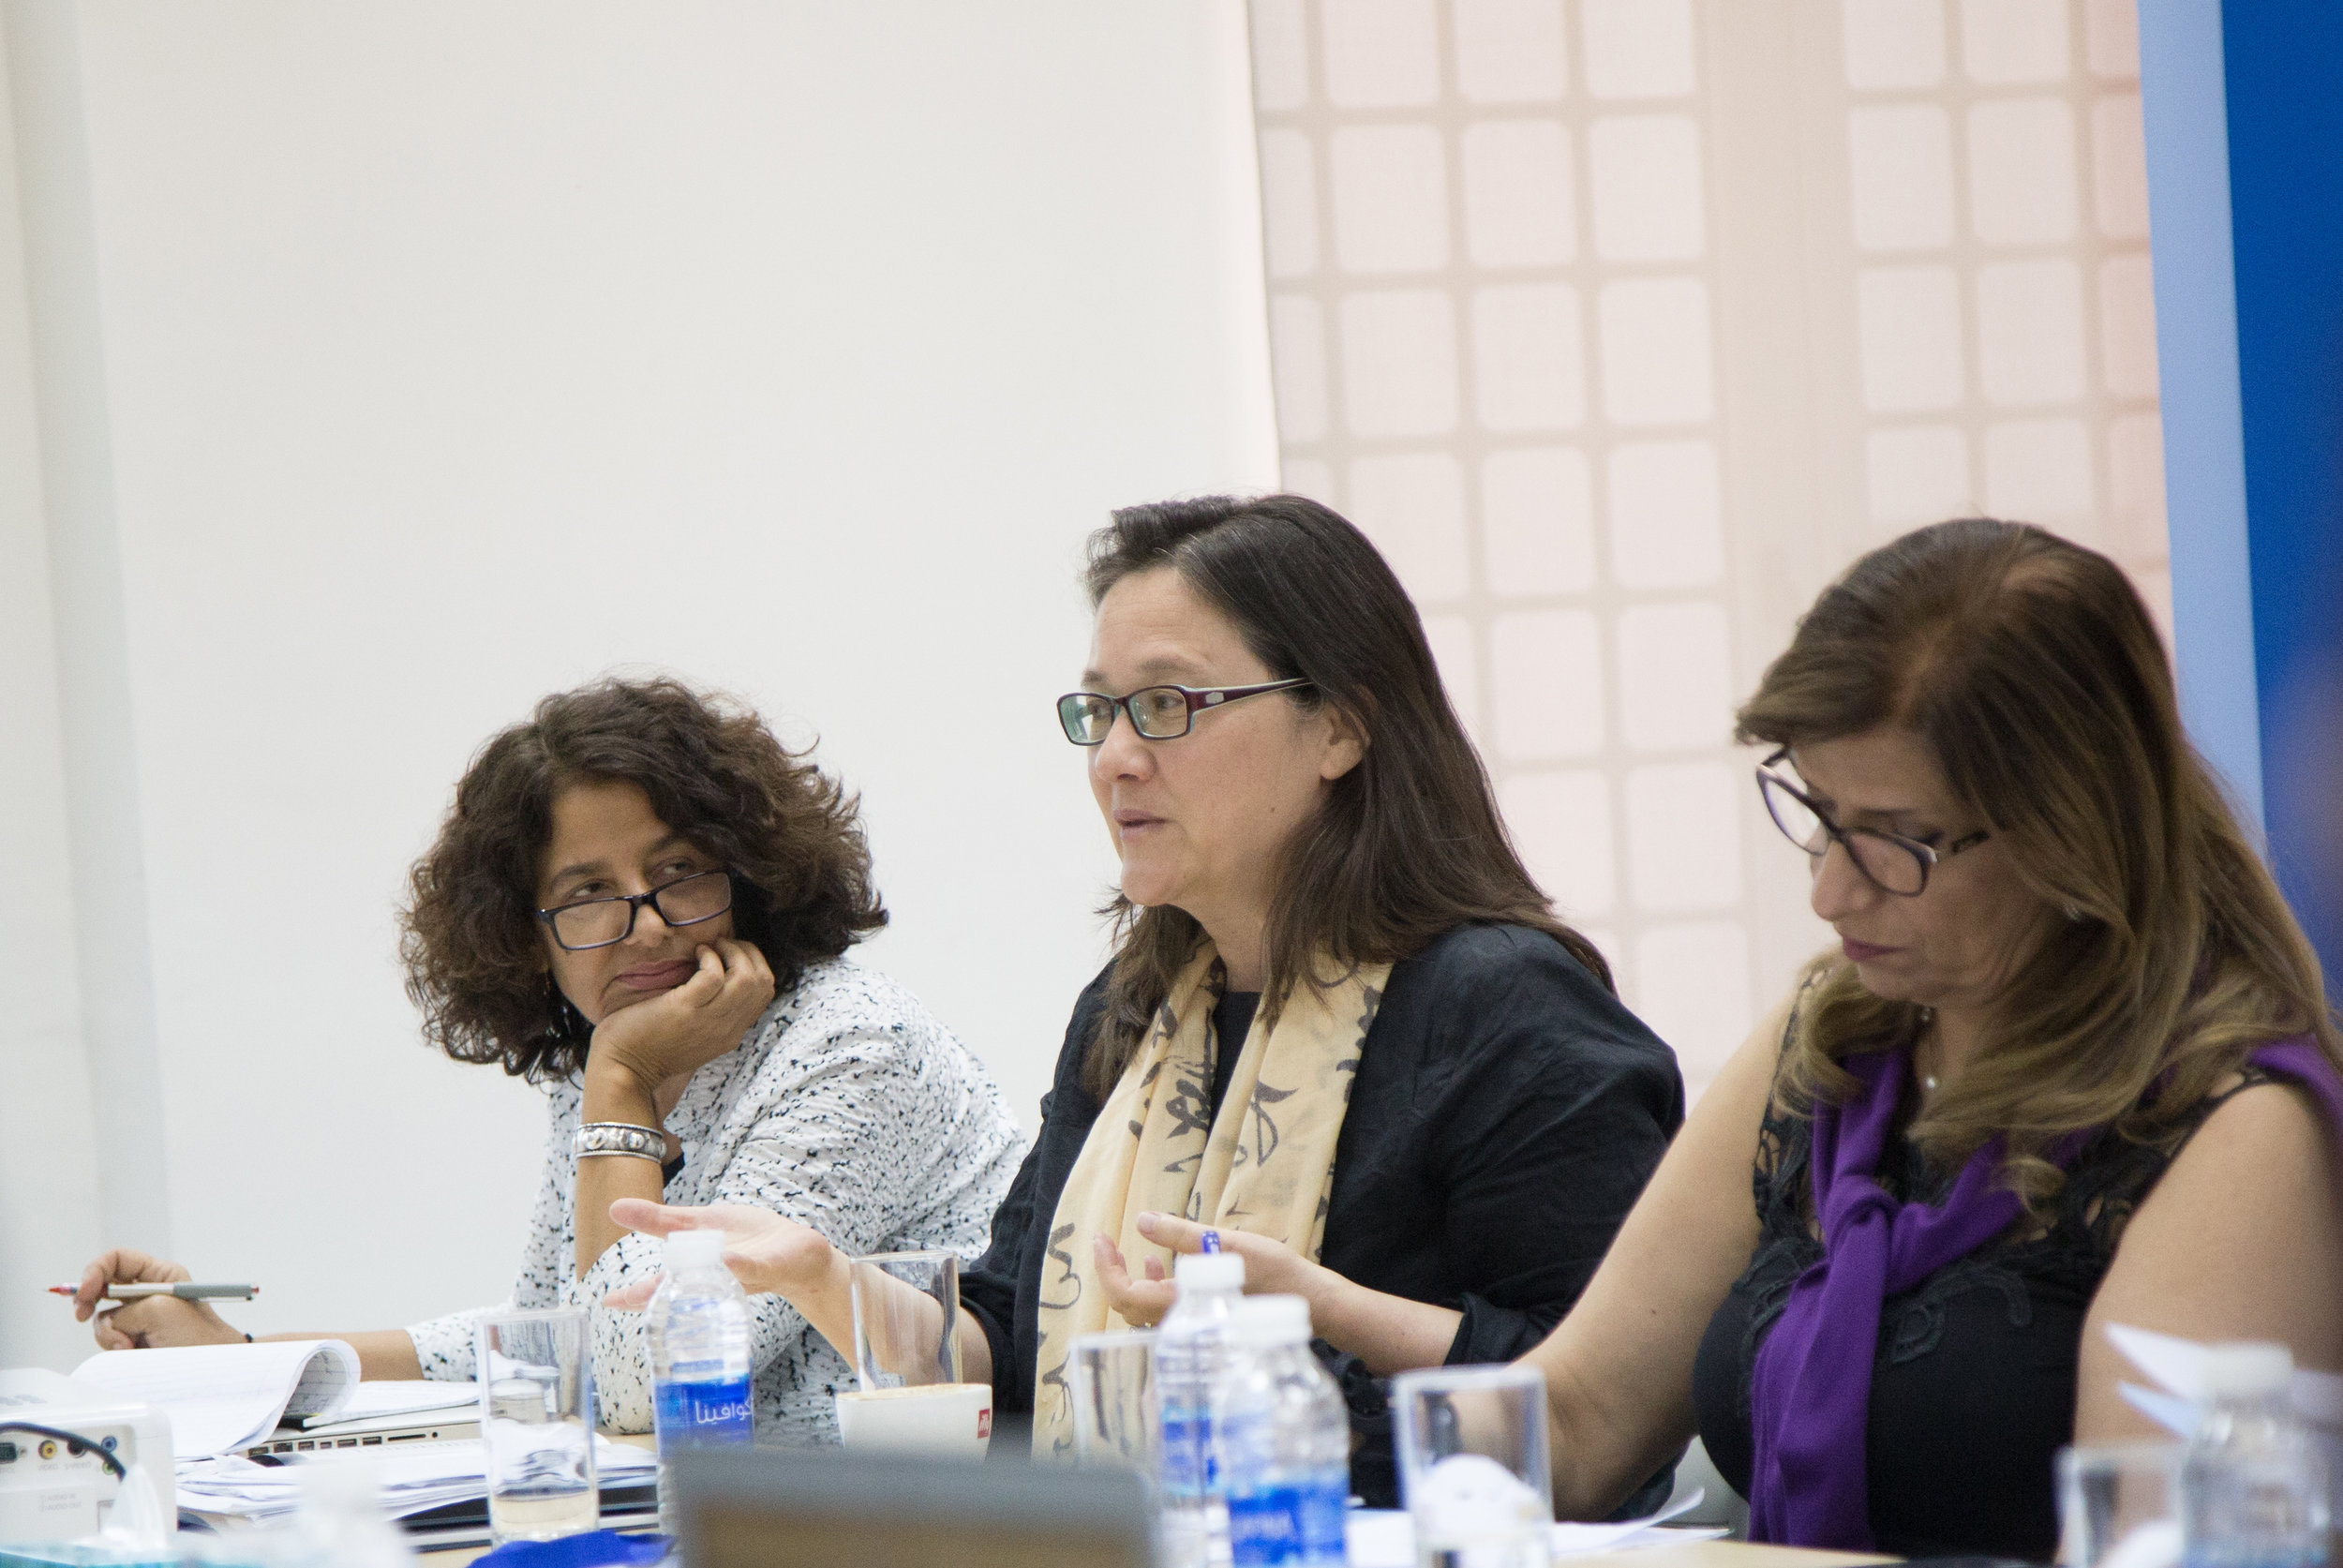 Rema Hammami, Leti Volpp, Nadera Shalhoub-Kevorkian